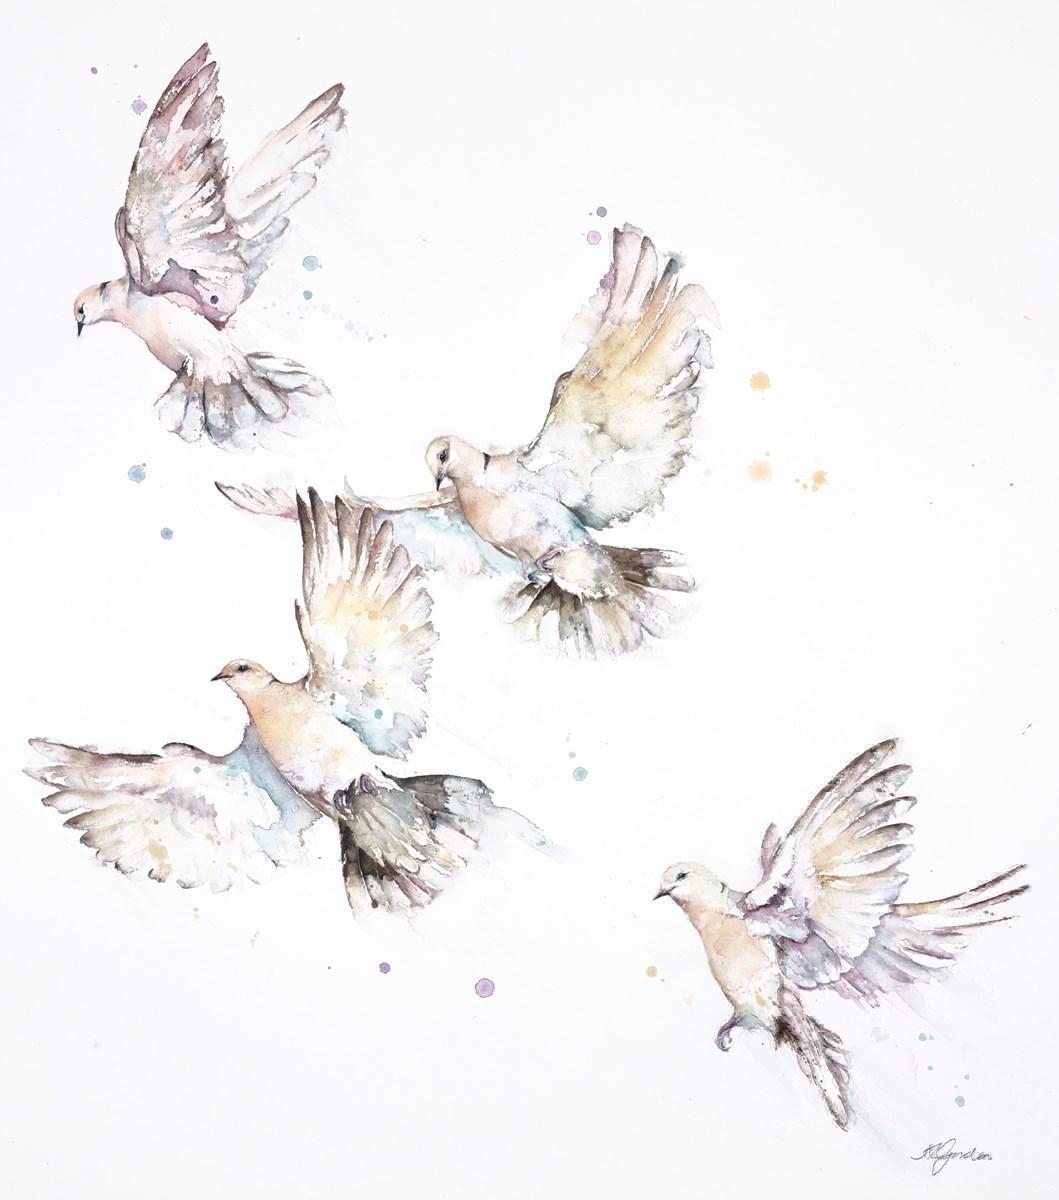 Taking Flight - Ringed Doves